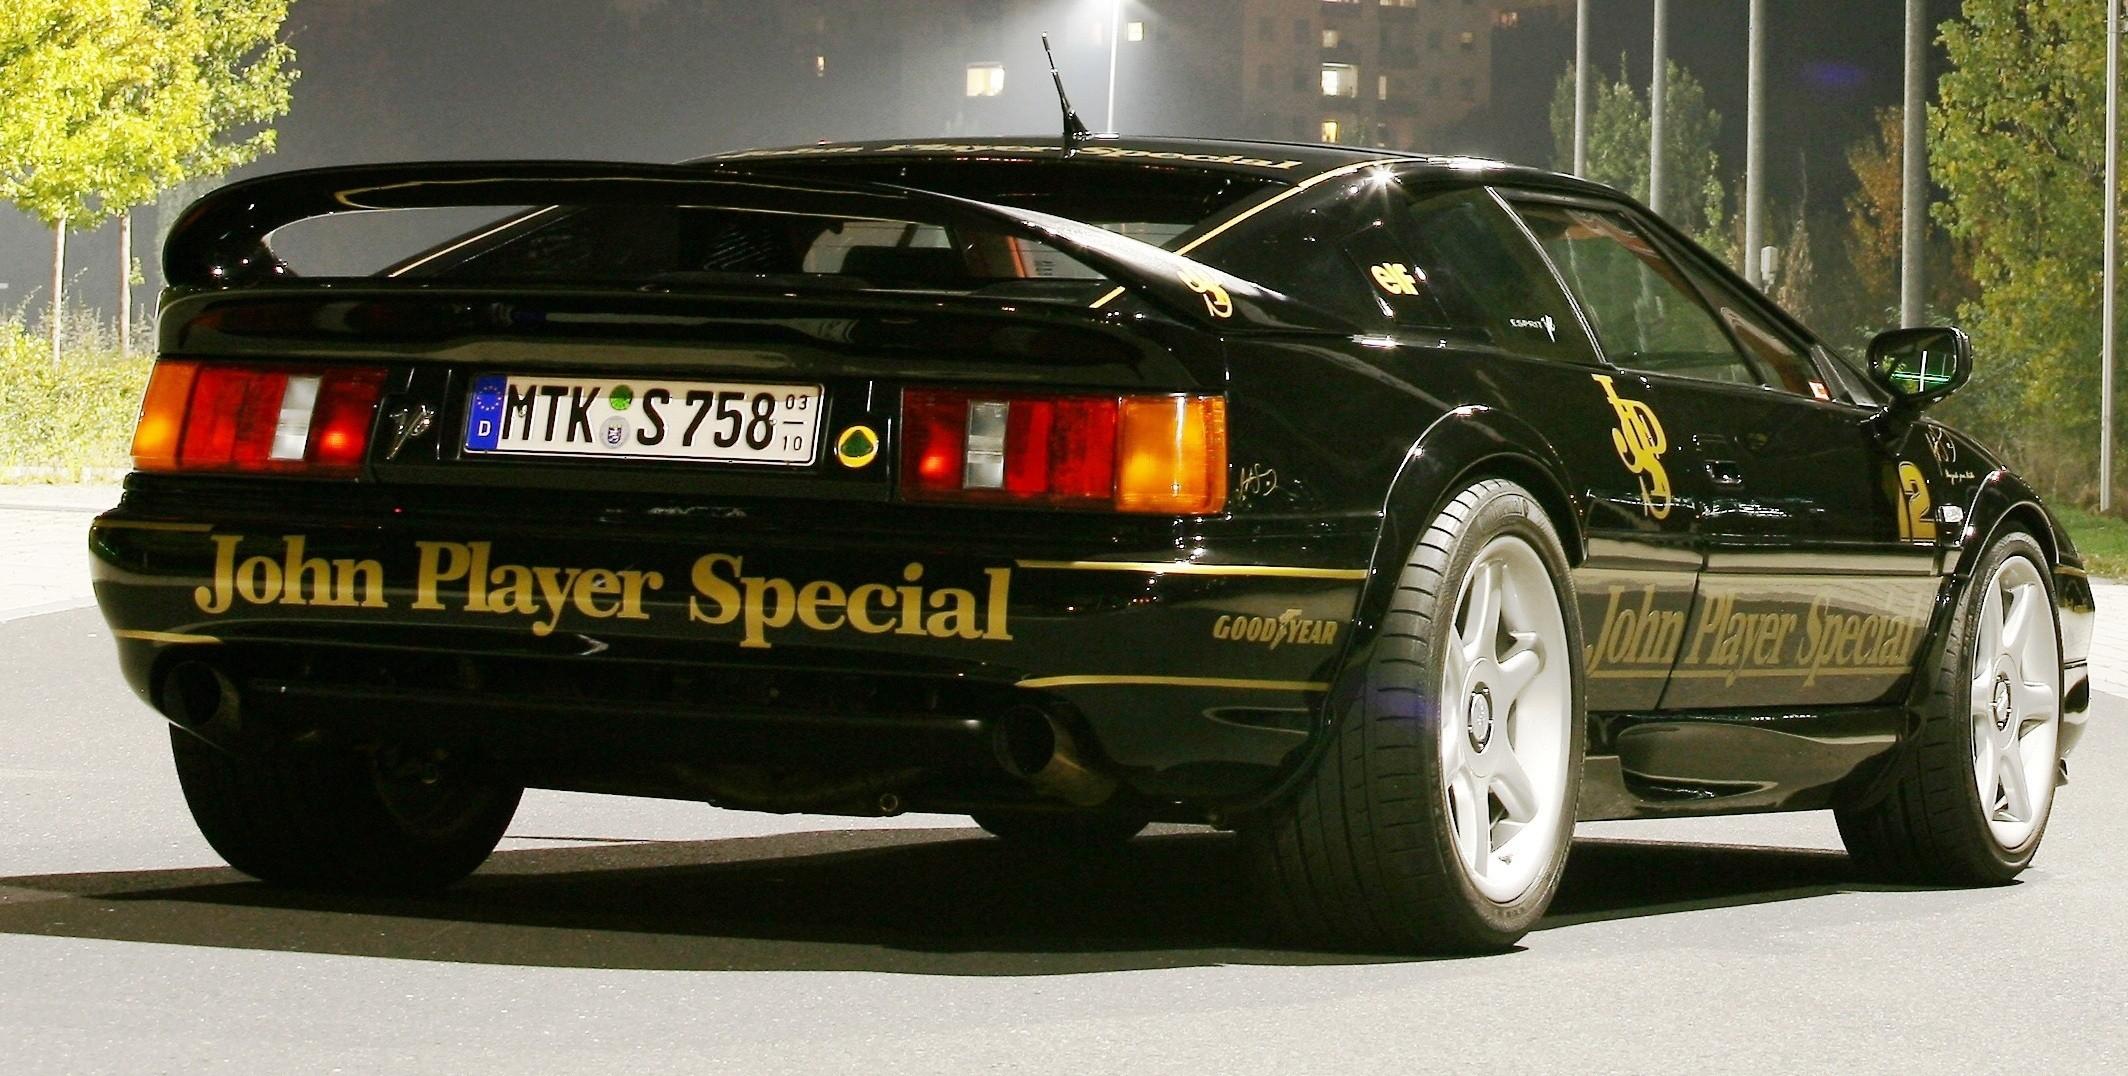 Lotus Esprit in Ayrton Senna JPS Livery by CAMSHAFT 5